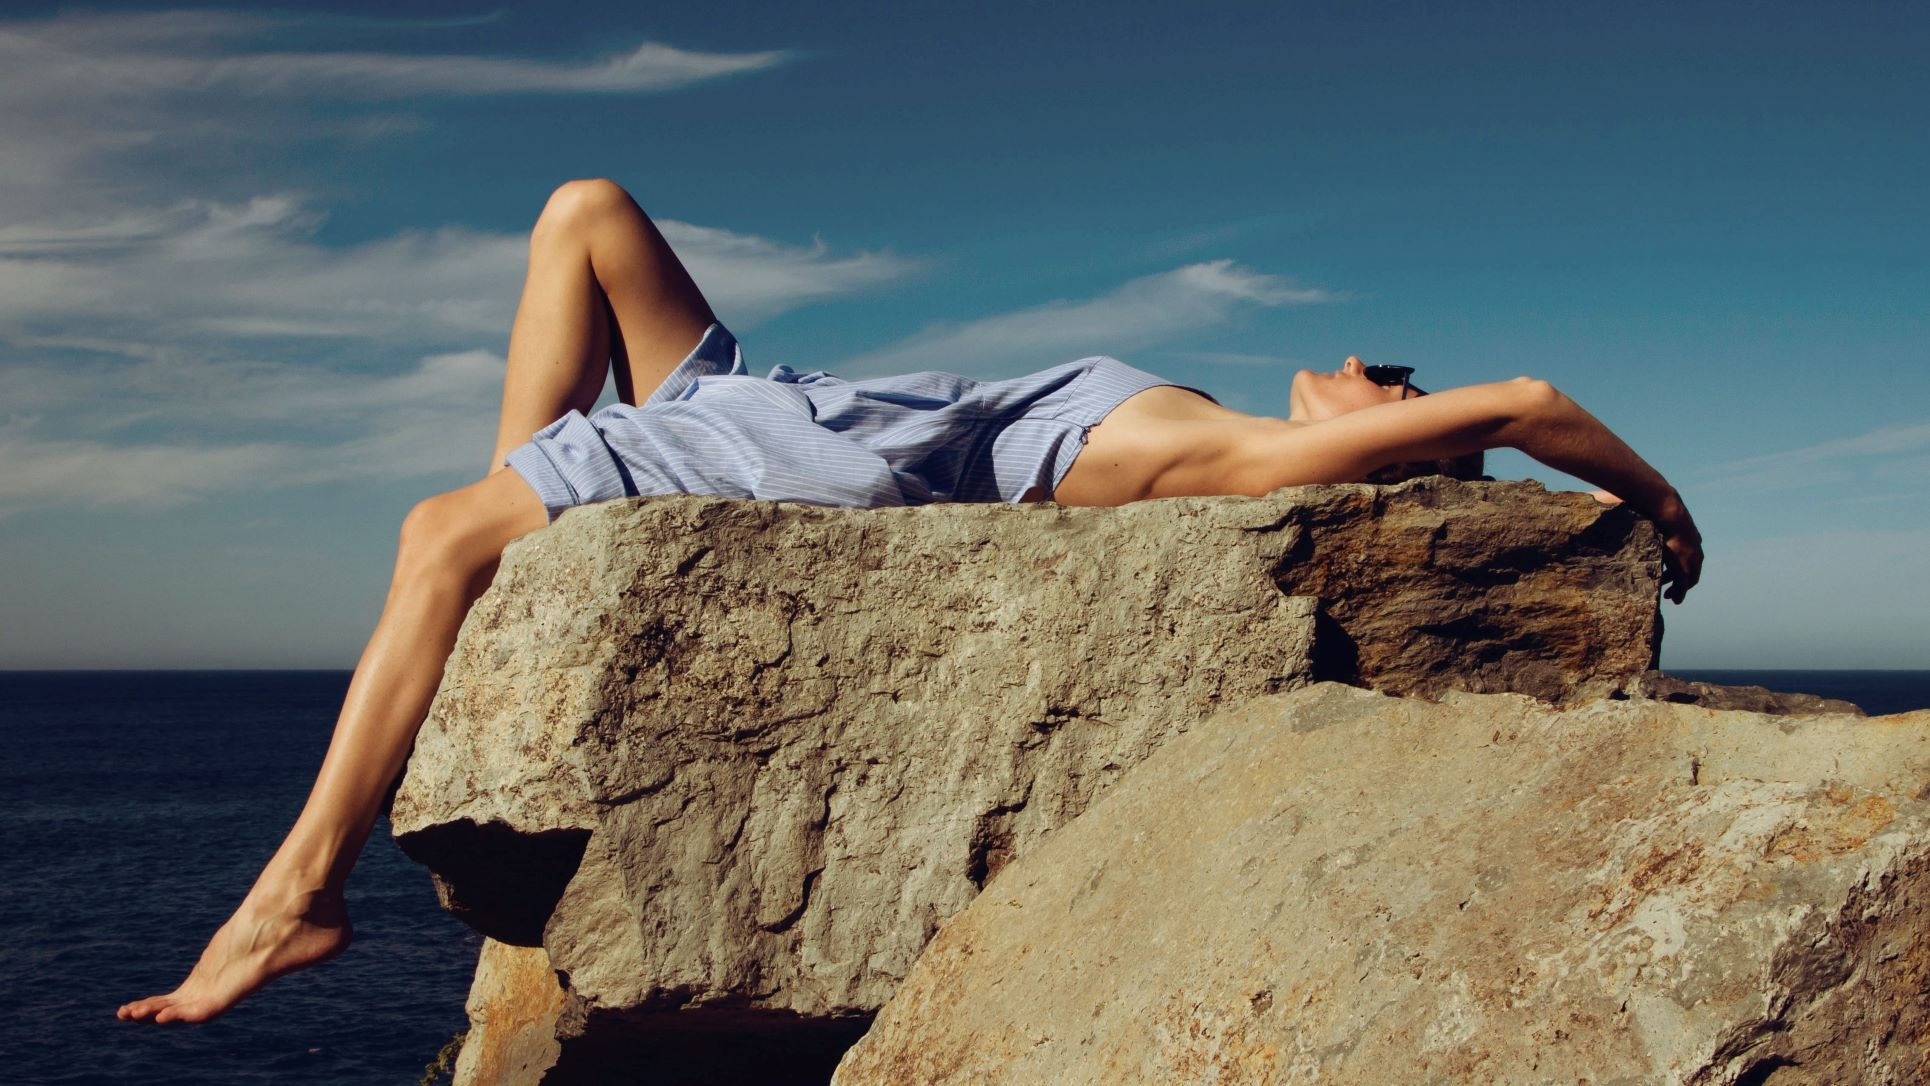 a woman lying under the sun